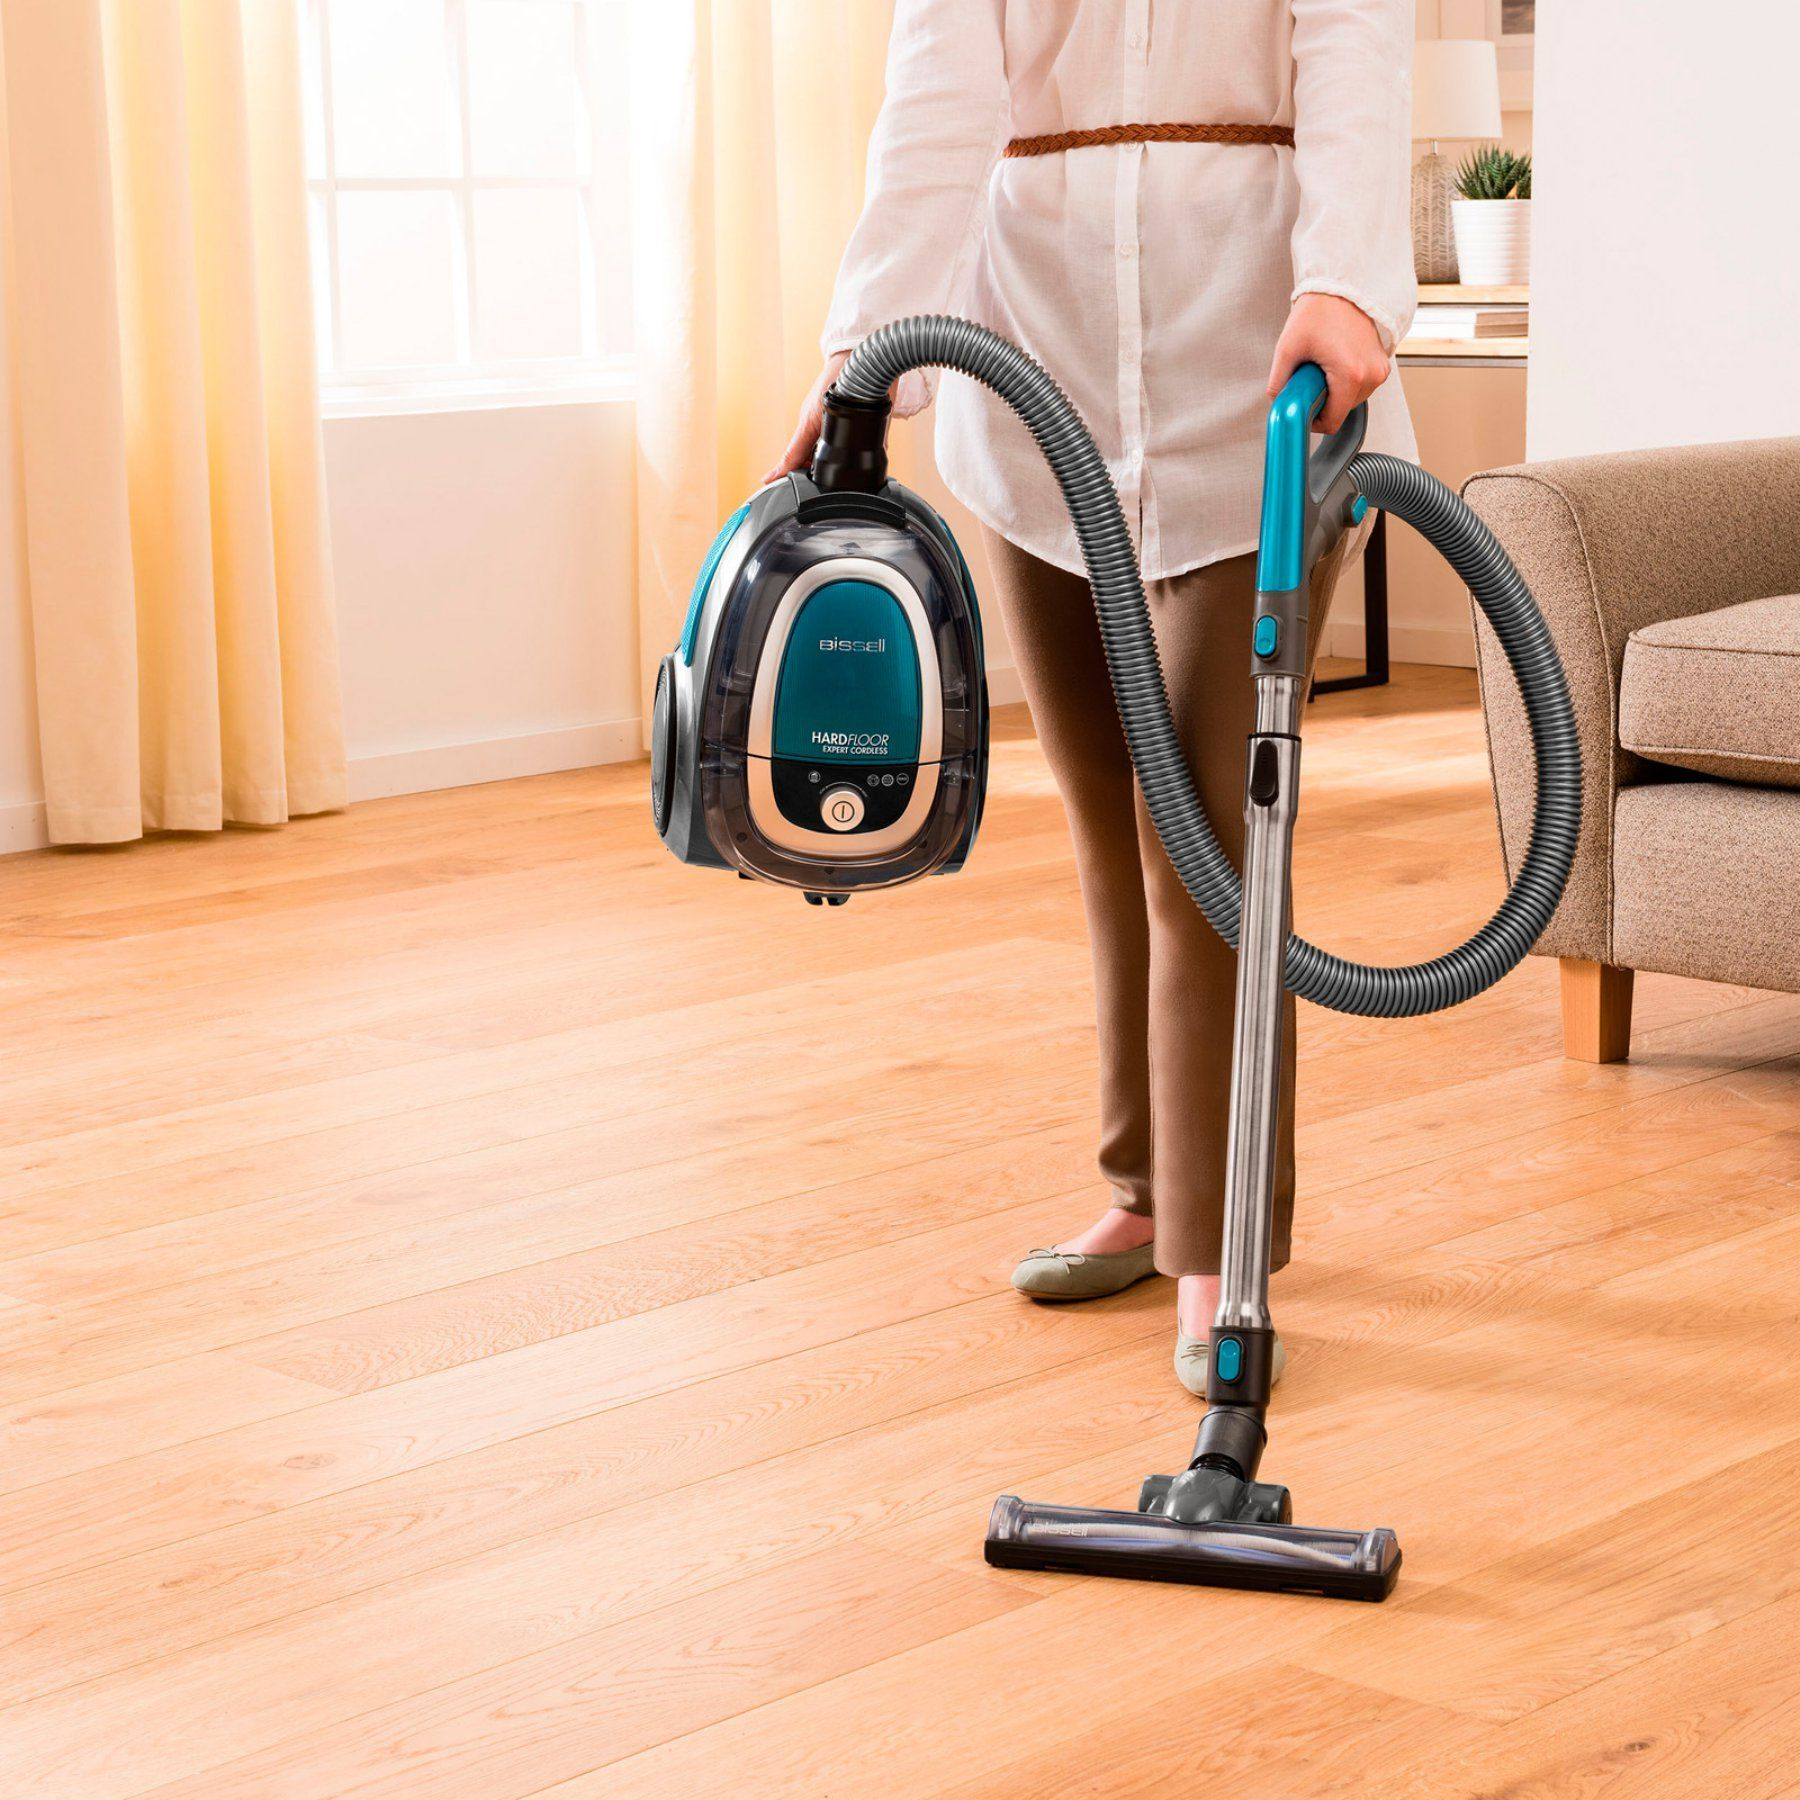 Bissell 36v Hard Floor Expert Cordless Canister Vacuum